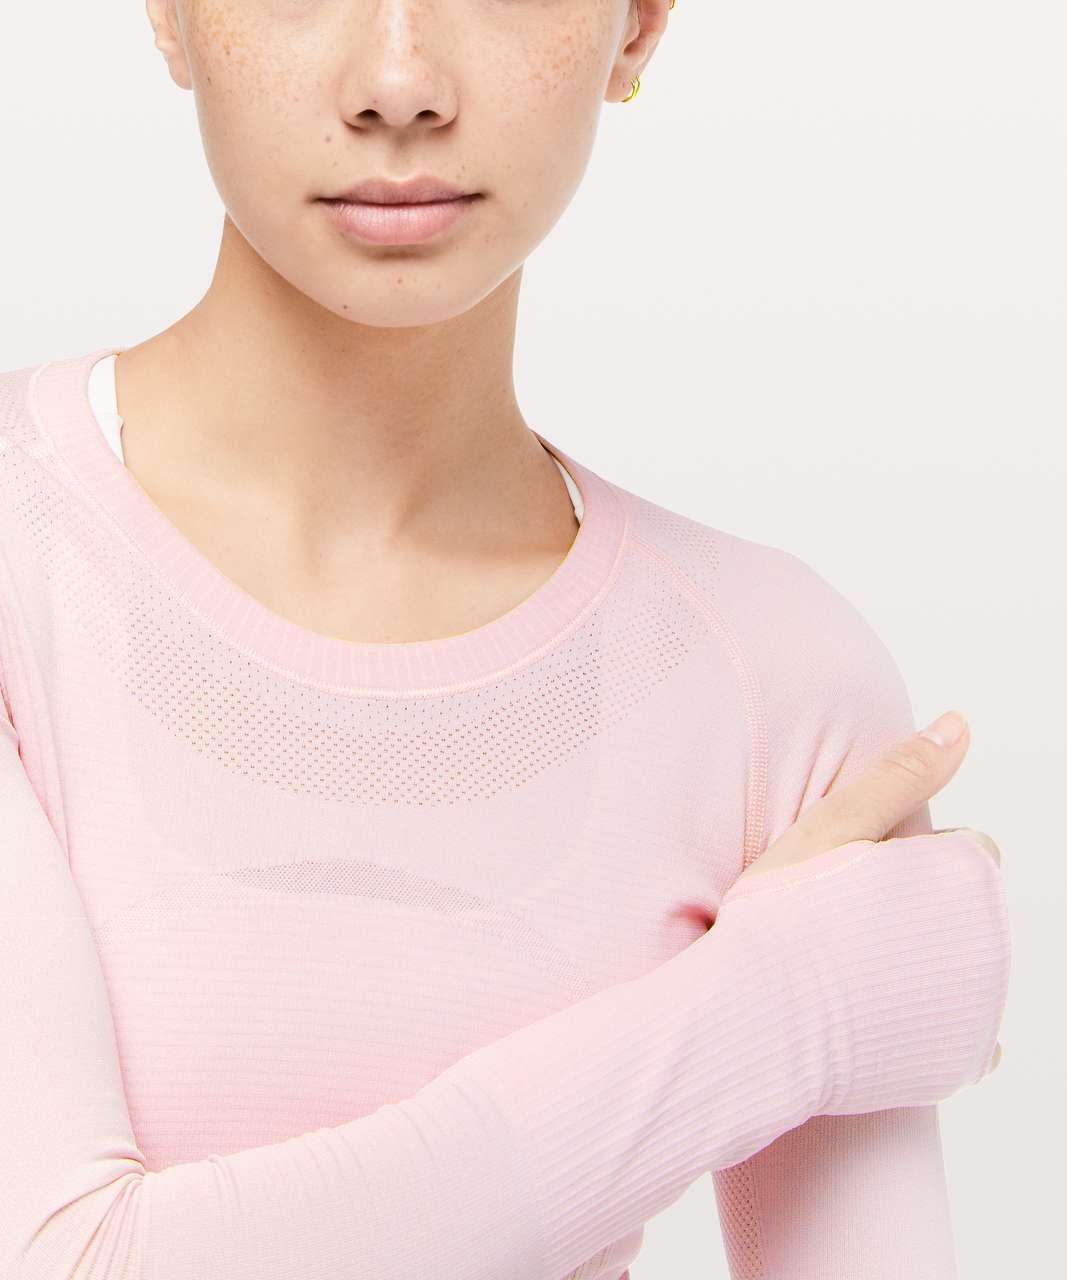 Lululemon Swiftly Tech Long Sleeve Crew - Blissful Pink / Blissful Pink